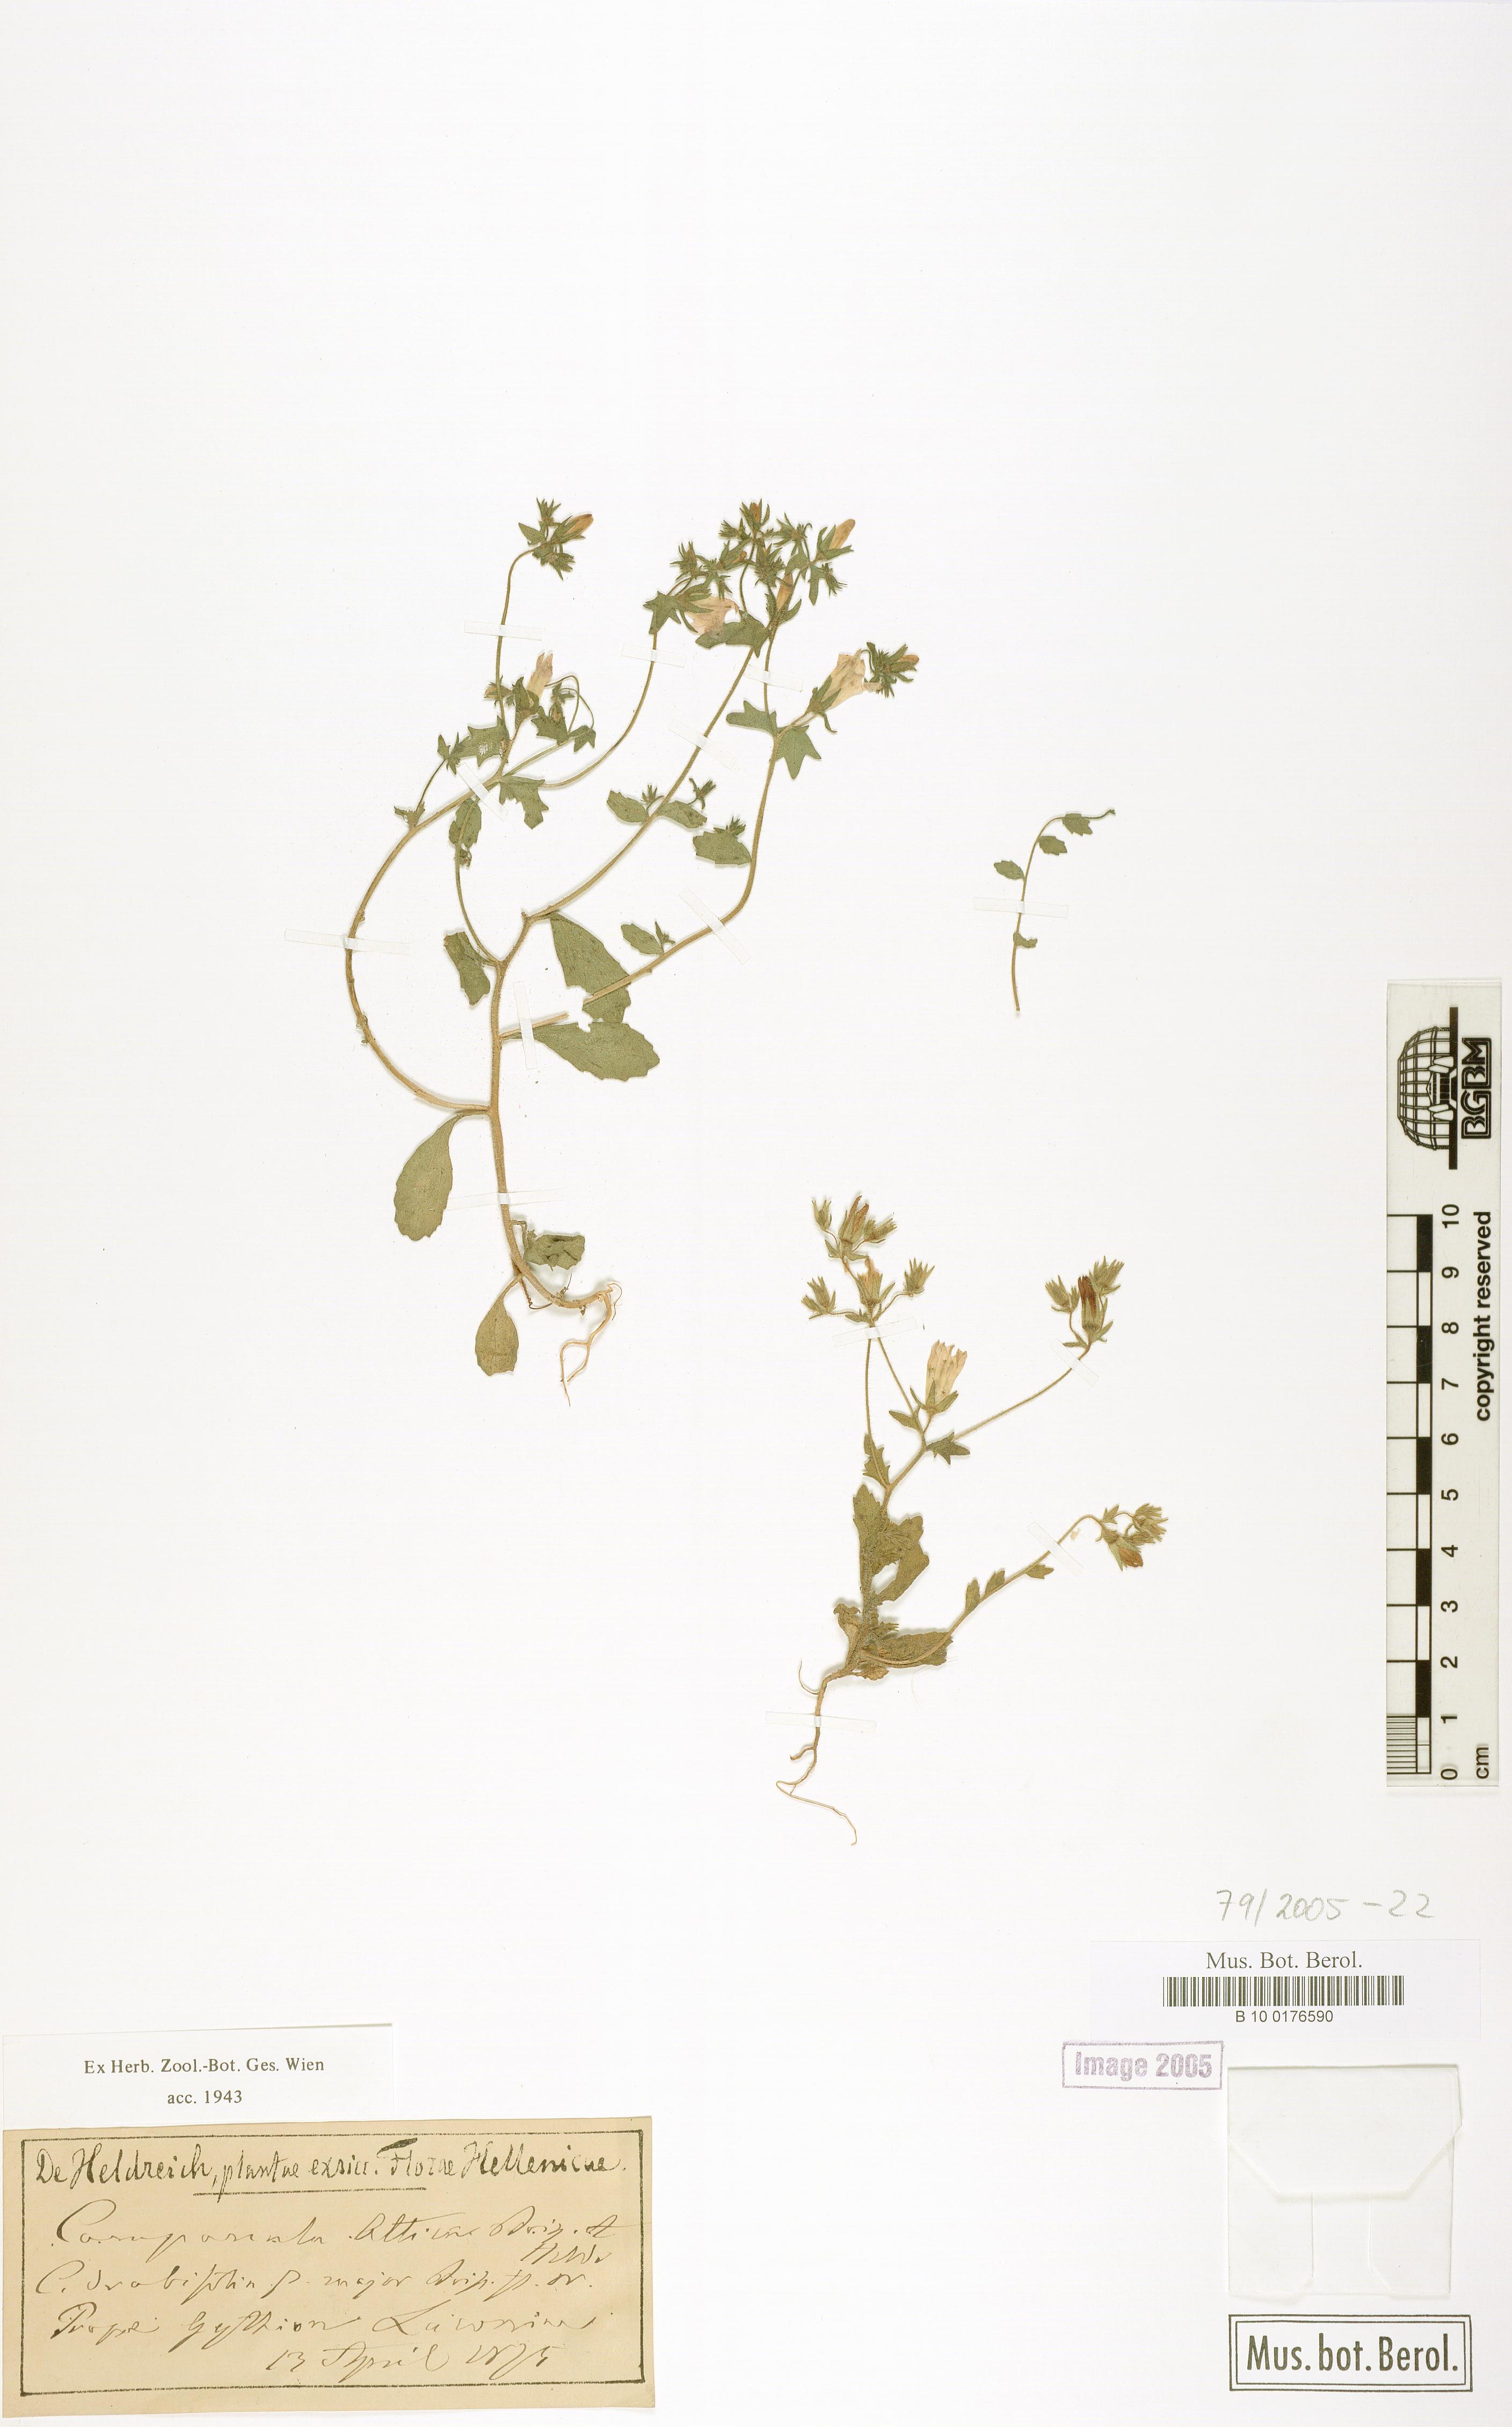 http://ww2.bgbm.org/herbarium/images/B/10/01/76/59/B_10_0176590.jpg